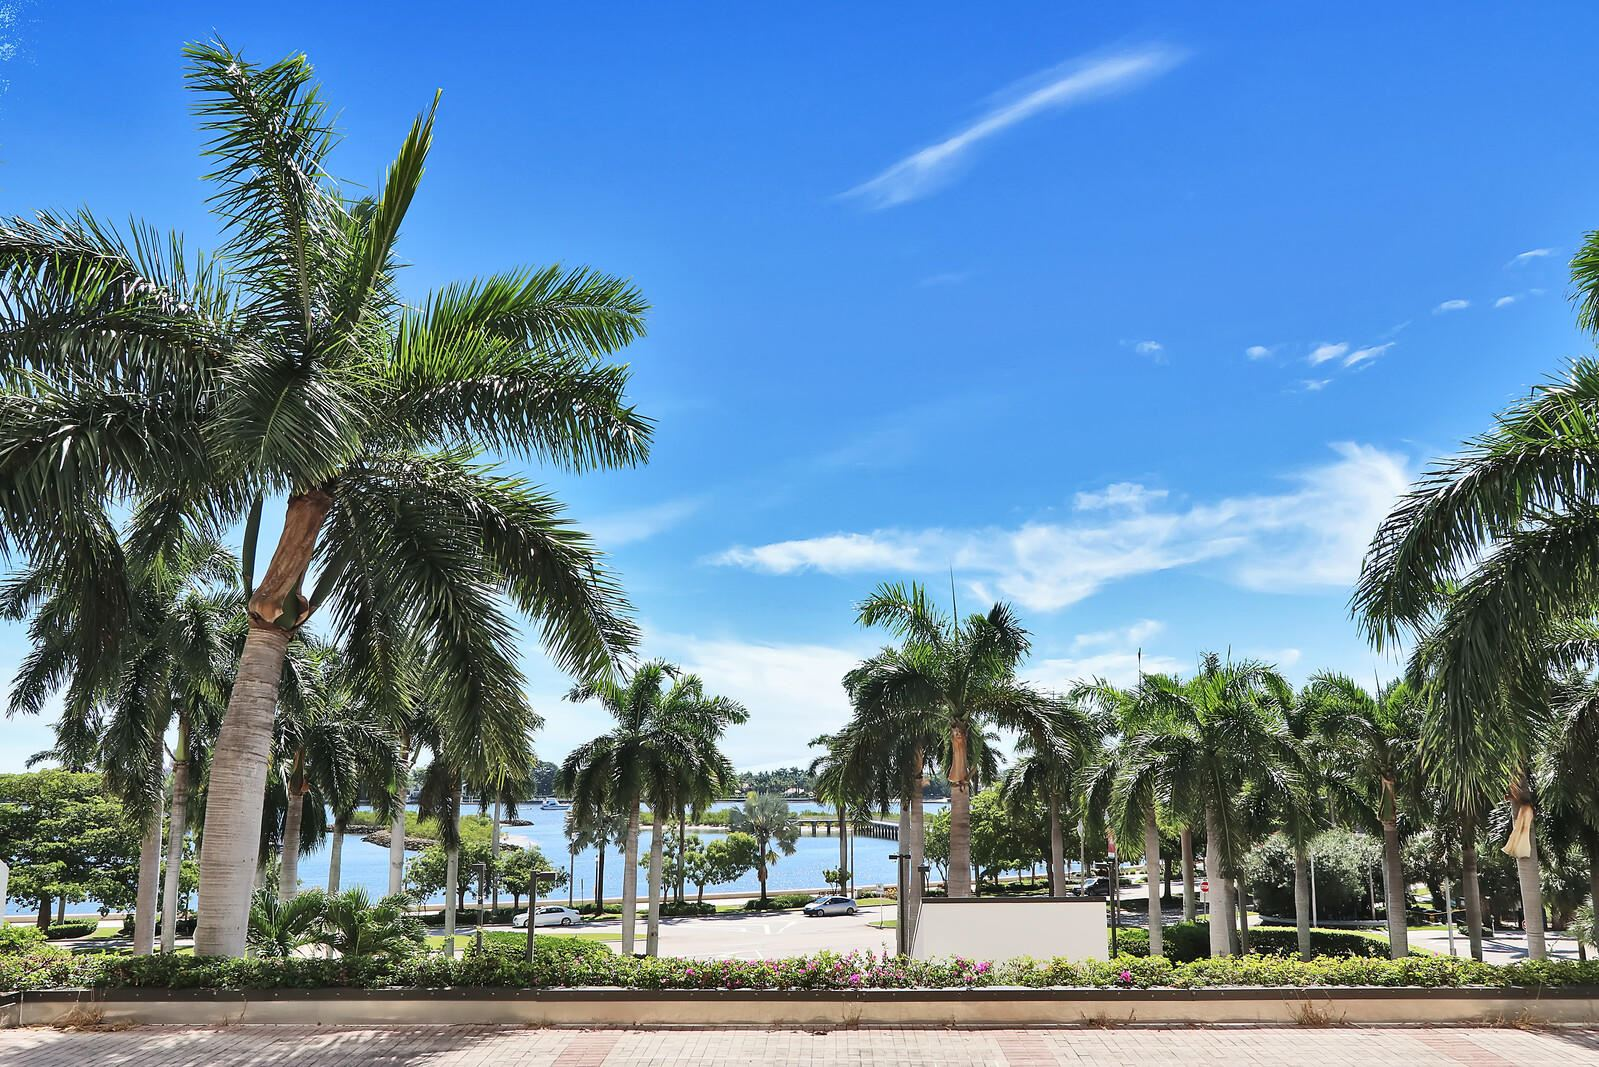 529 S Flagler Drive #Th3f, West Palm Beach, FL 33401 - #: RX-10665045